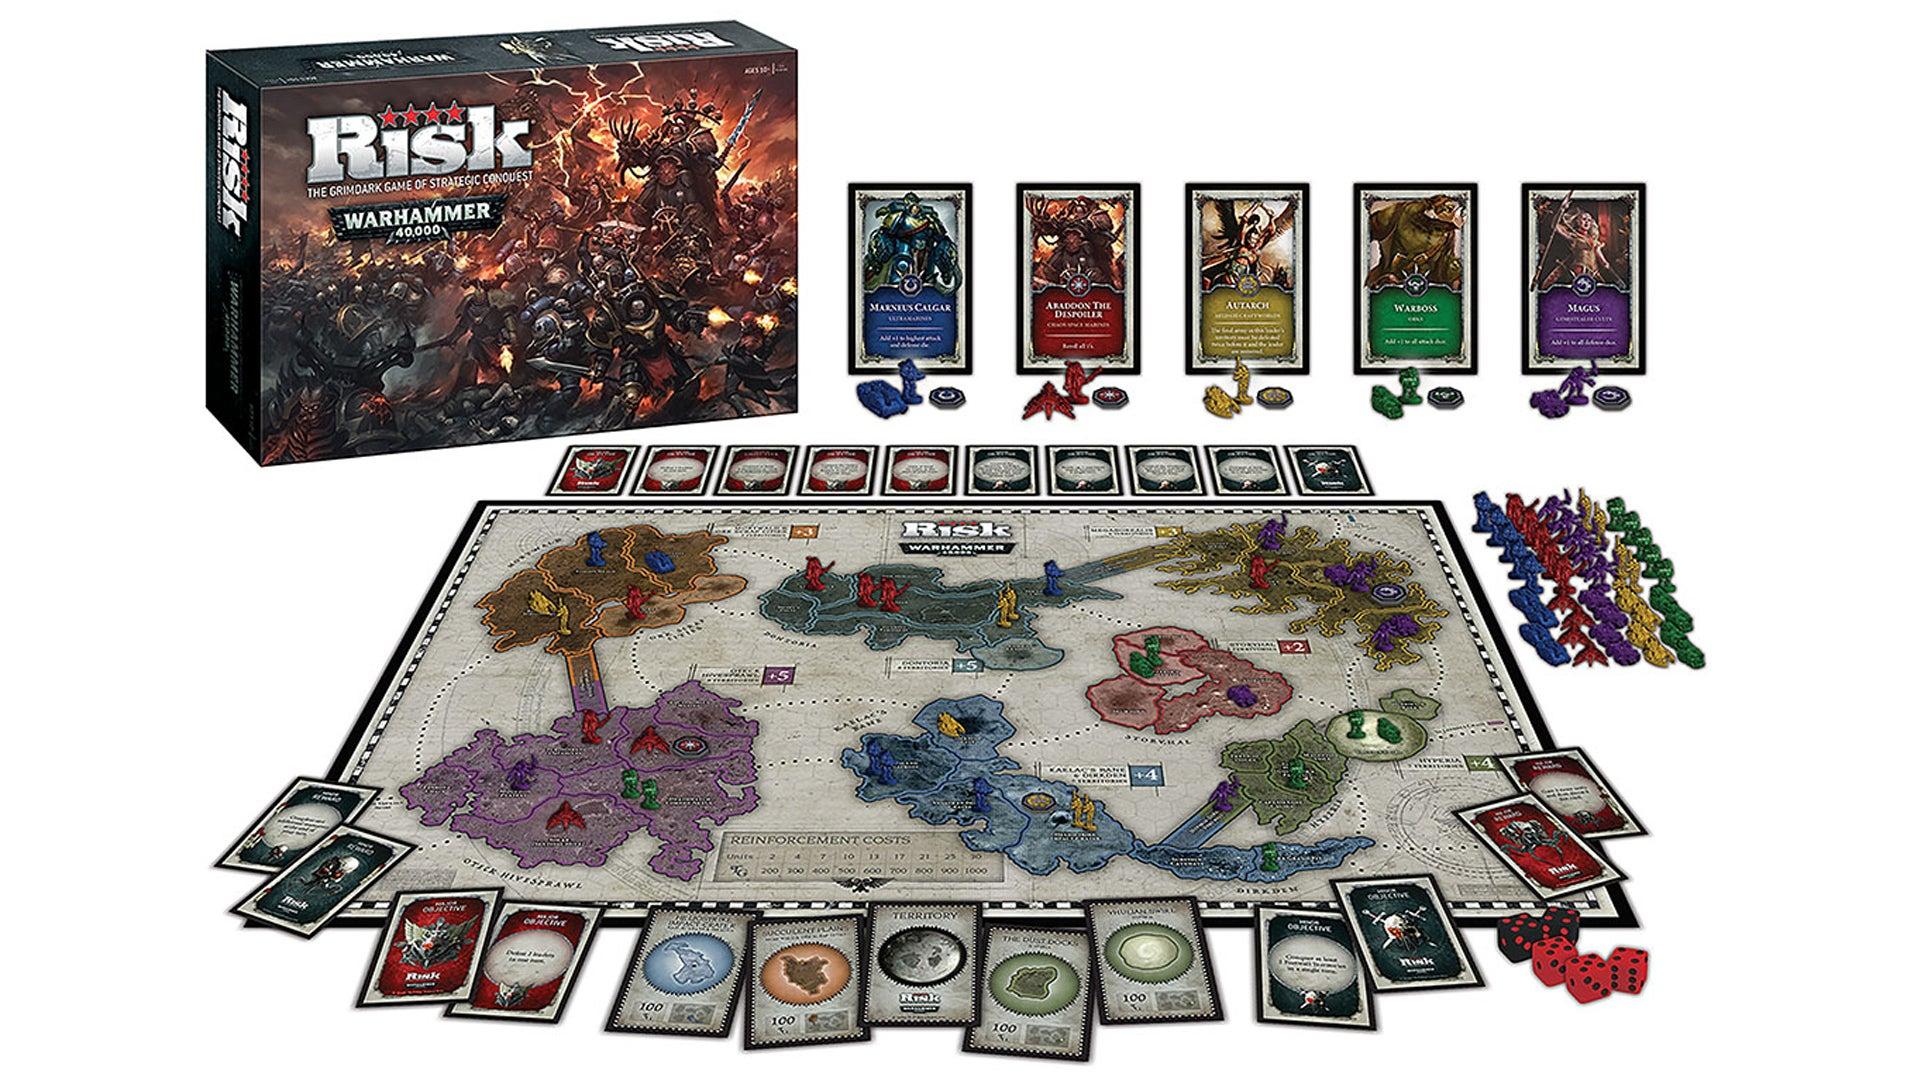 Risk: Warhammer 40,000 board game layout